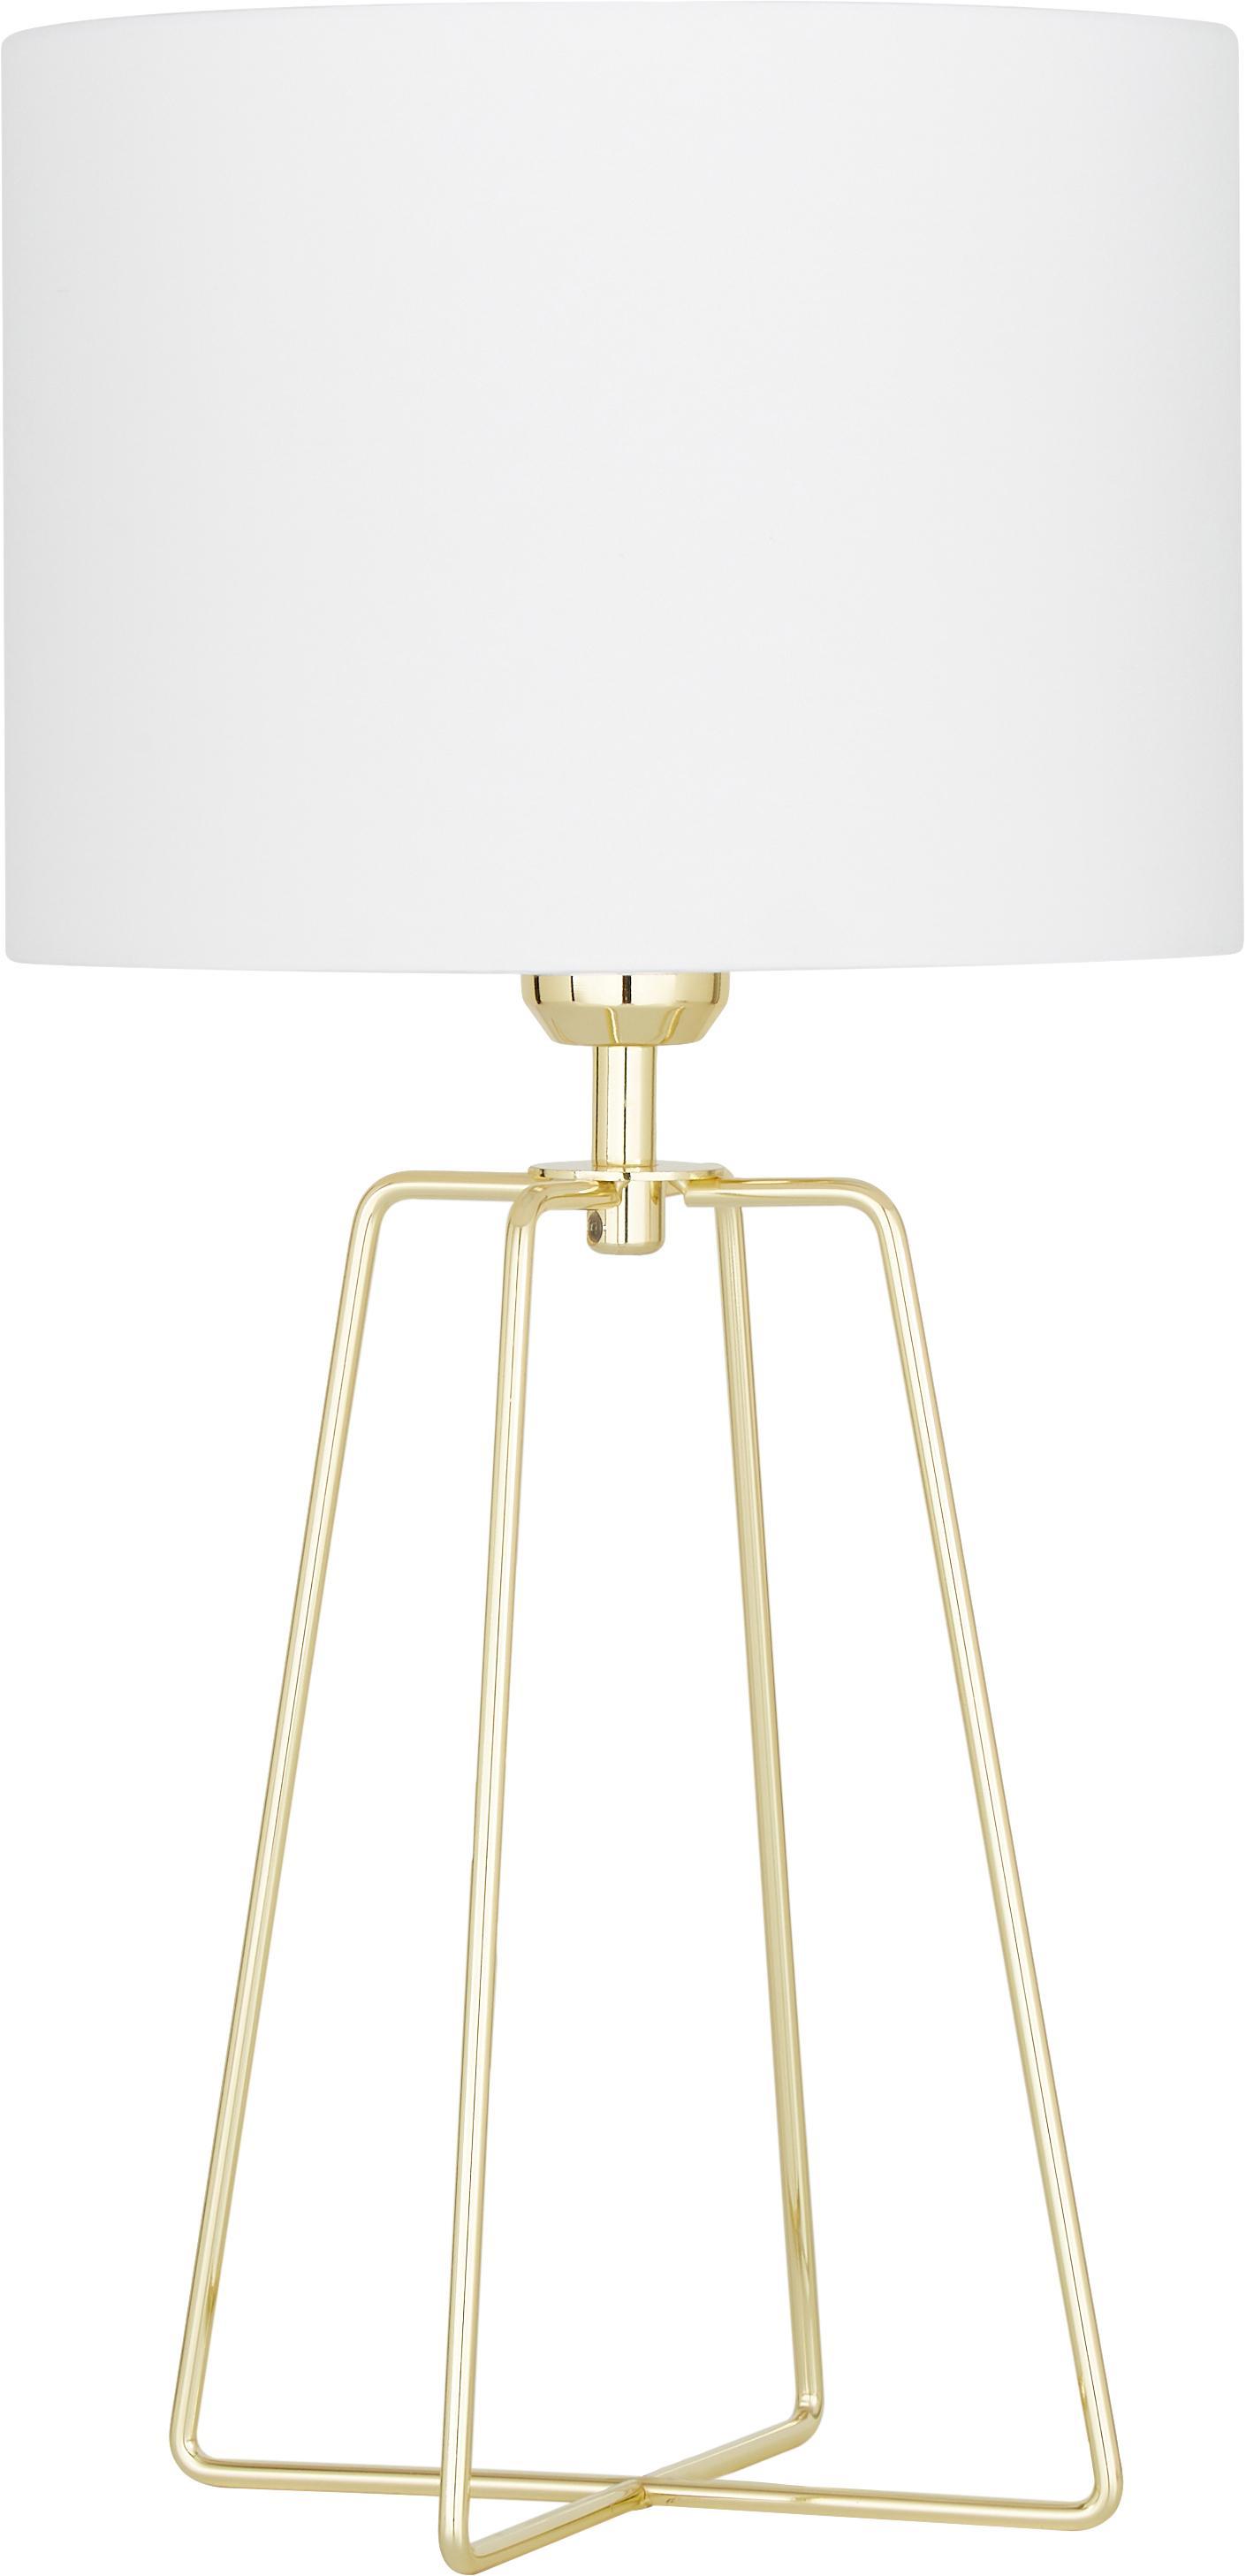 Tischlampe Karolina mit goldenem Lampenfuß, Lampenschirm: Textil, Lampenfuß: Metall, vermessingt, Weiß, Gold, Ø 25 x H 49 cm